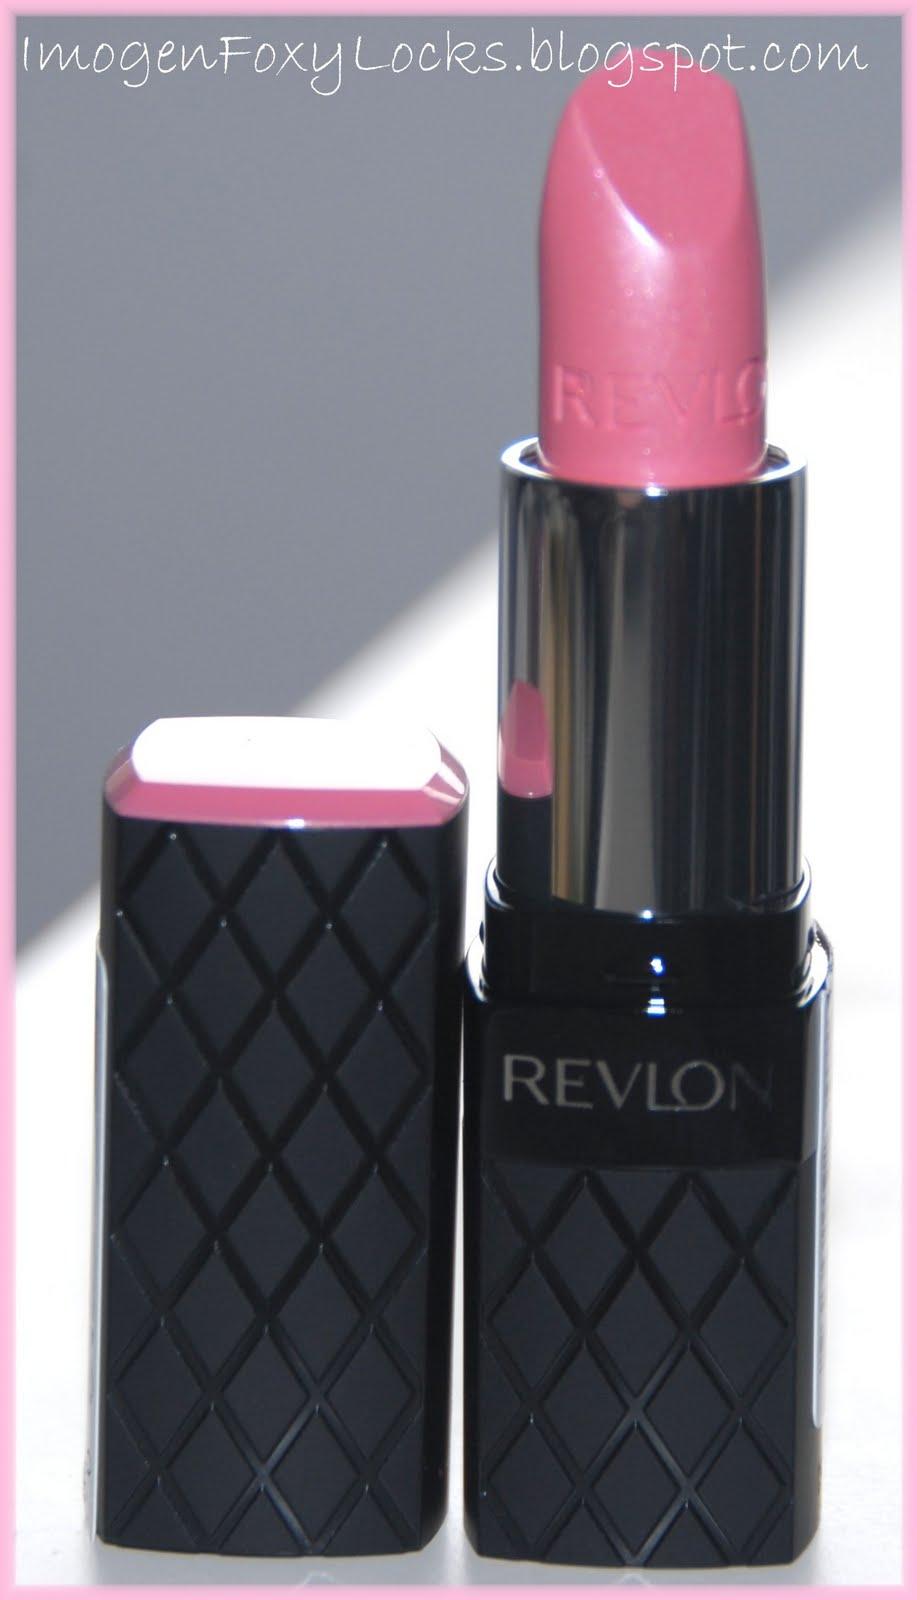 Imogen Foxy Locks: Revlon Colorburst Lipstick Swatches Review